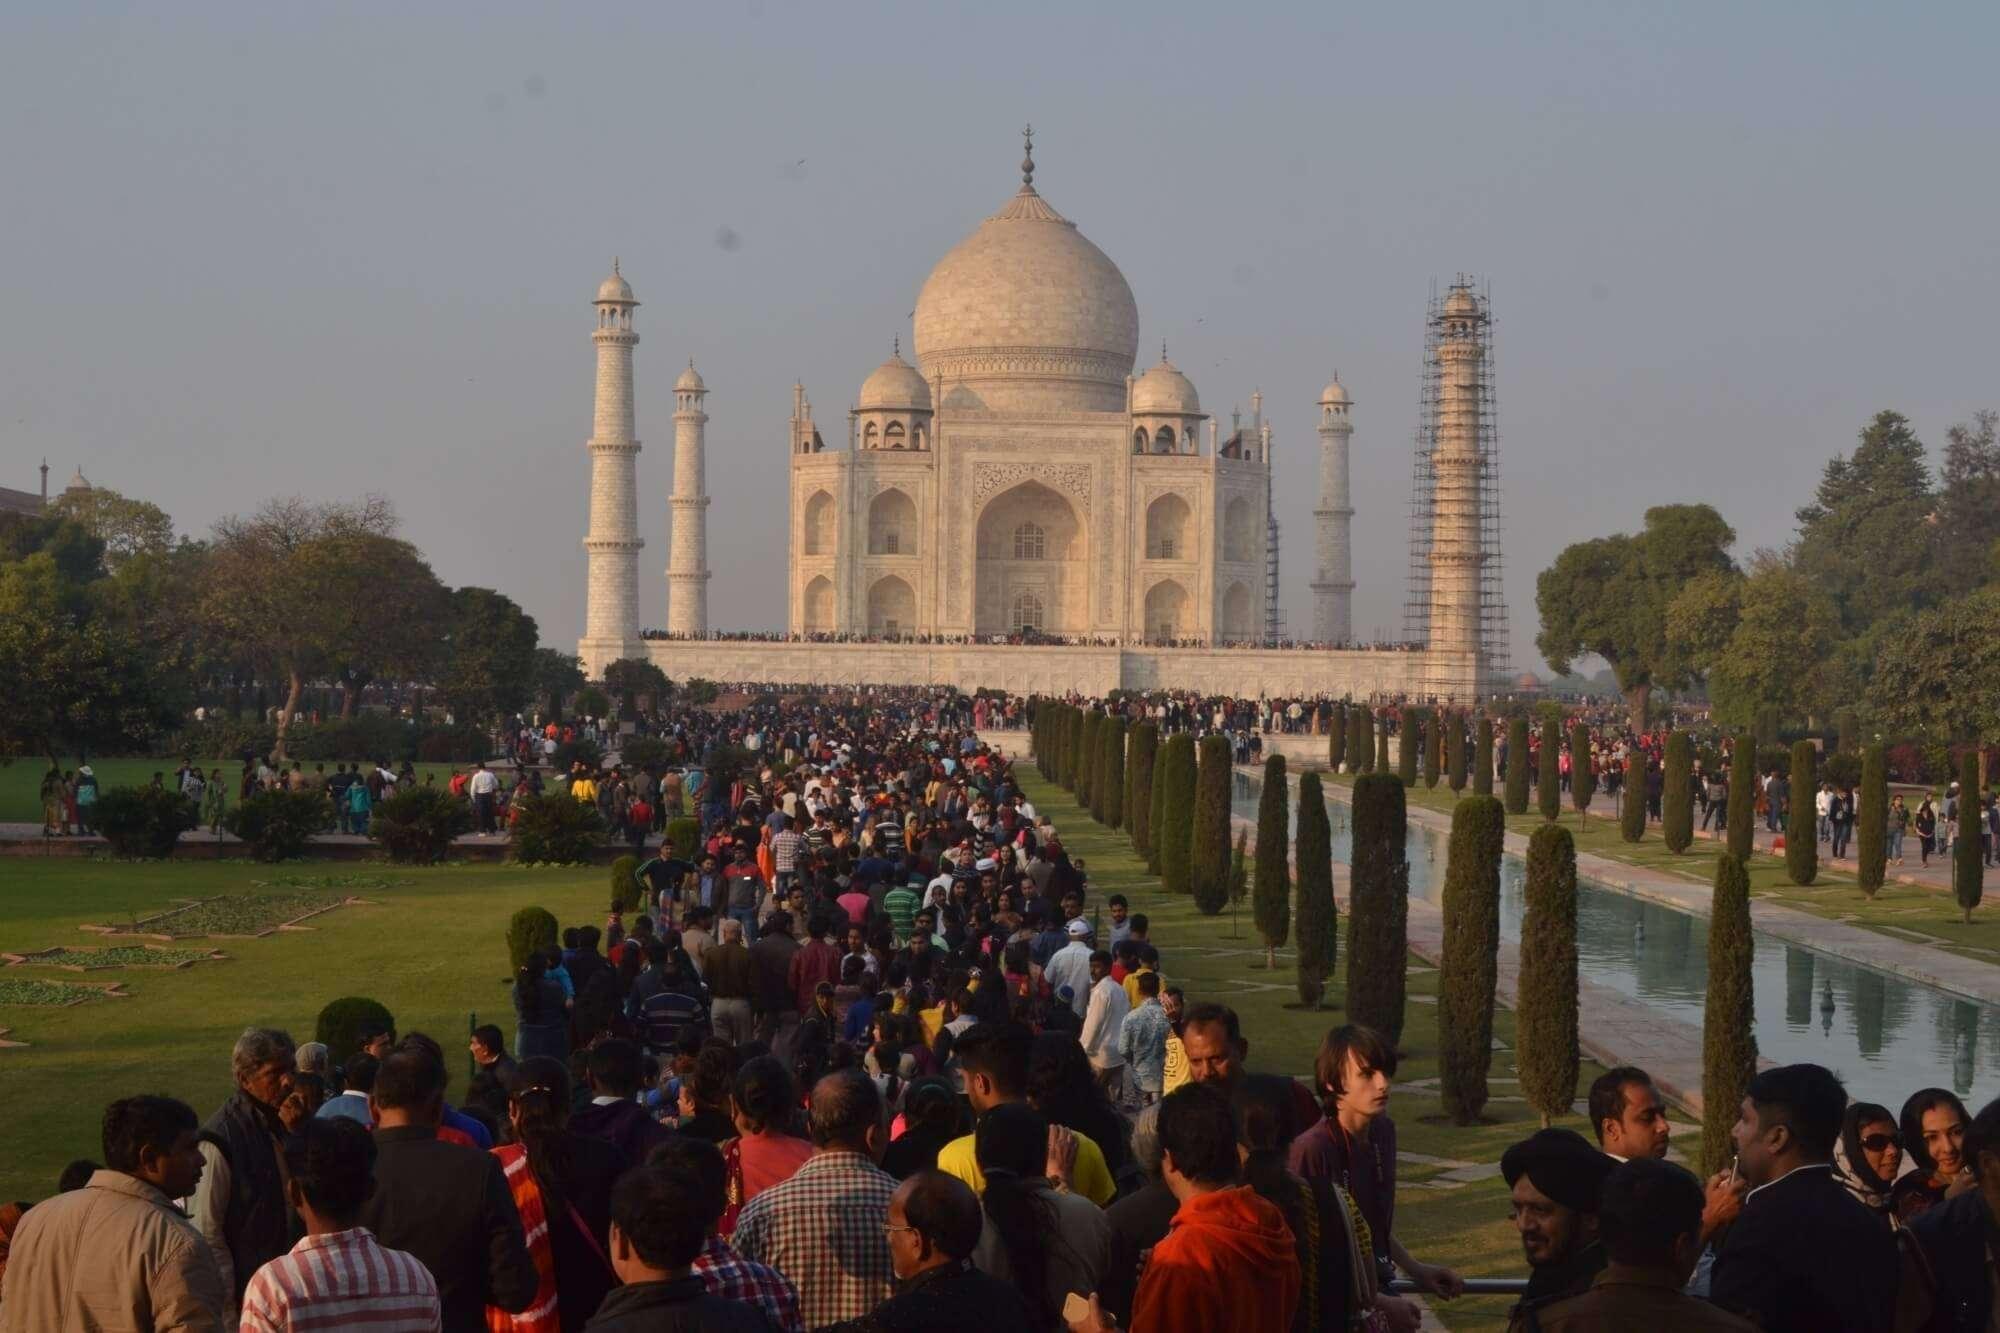 crowd in Taj Mahal